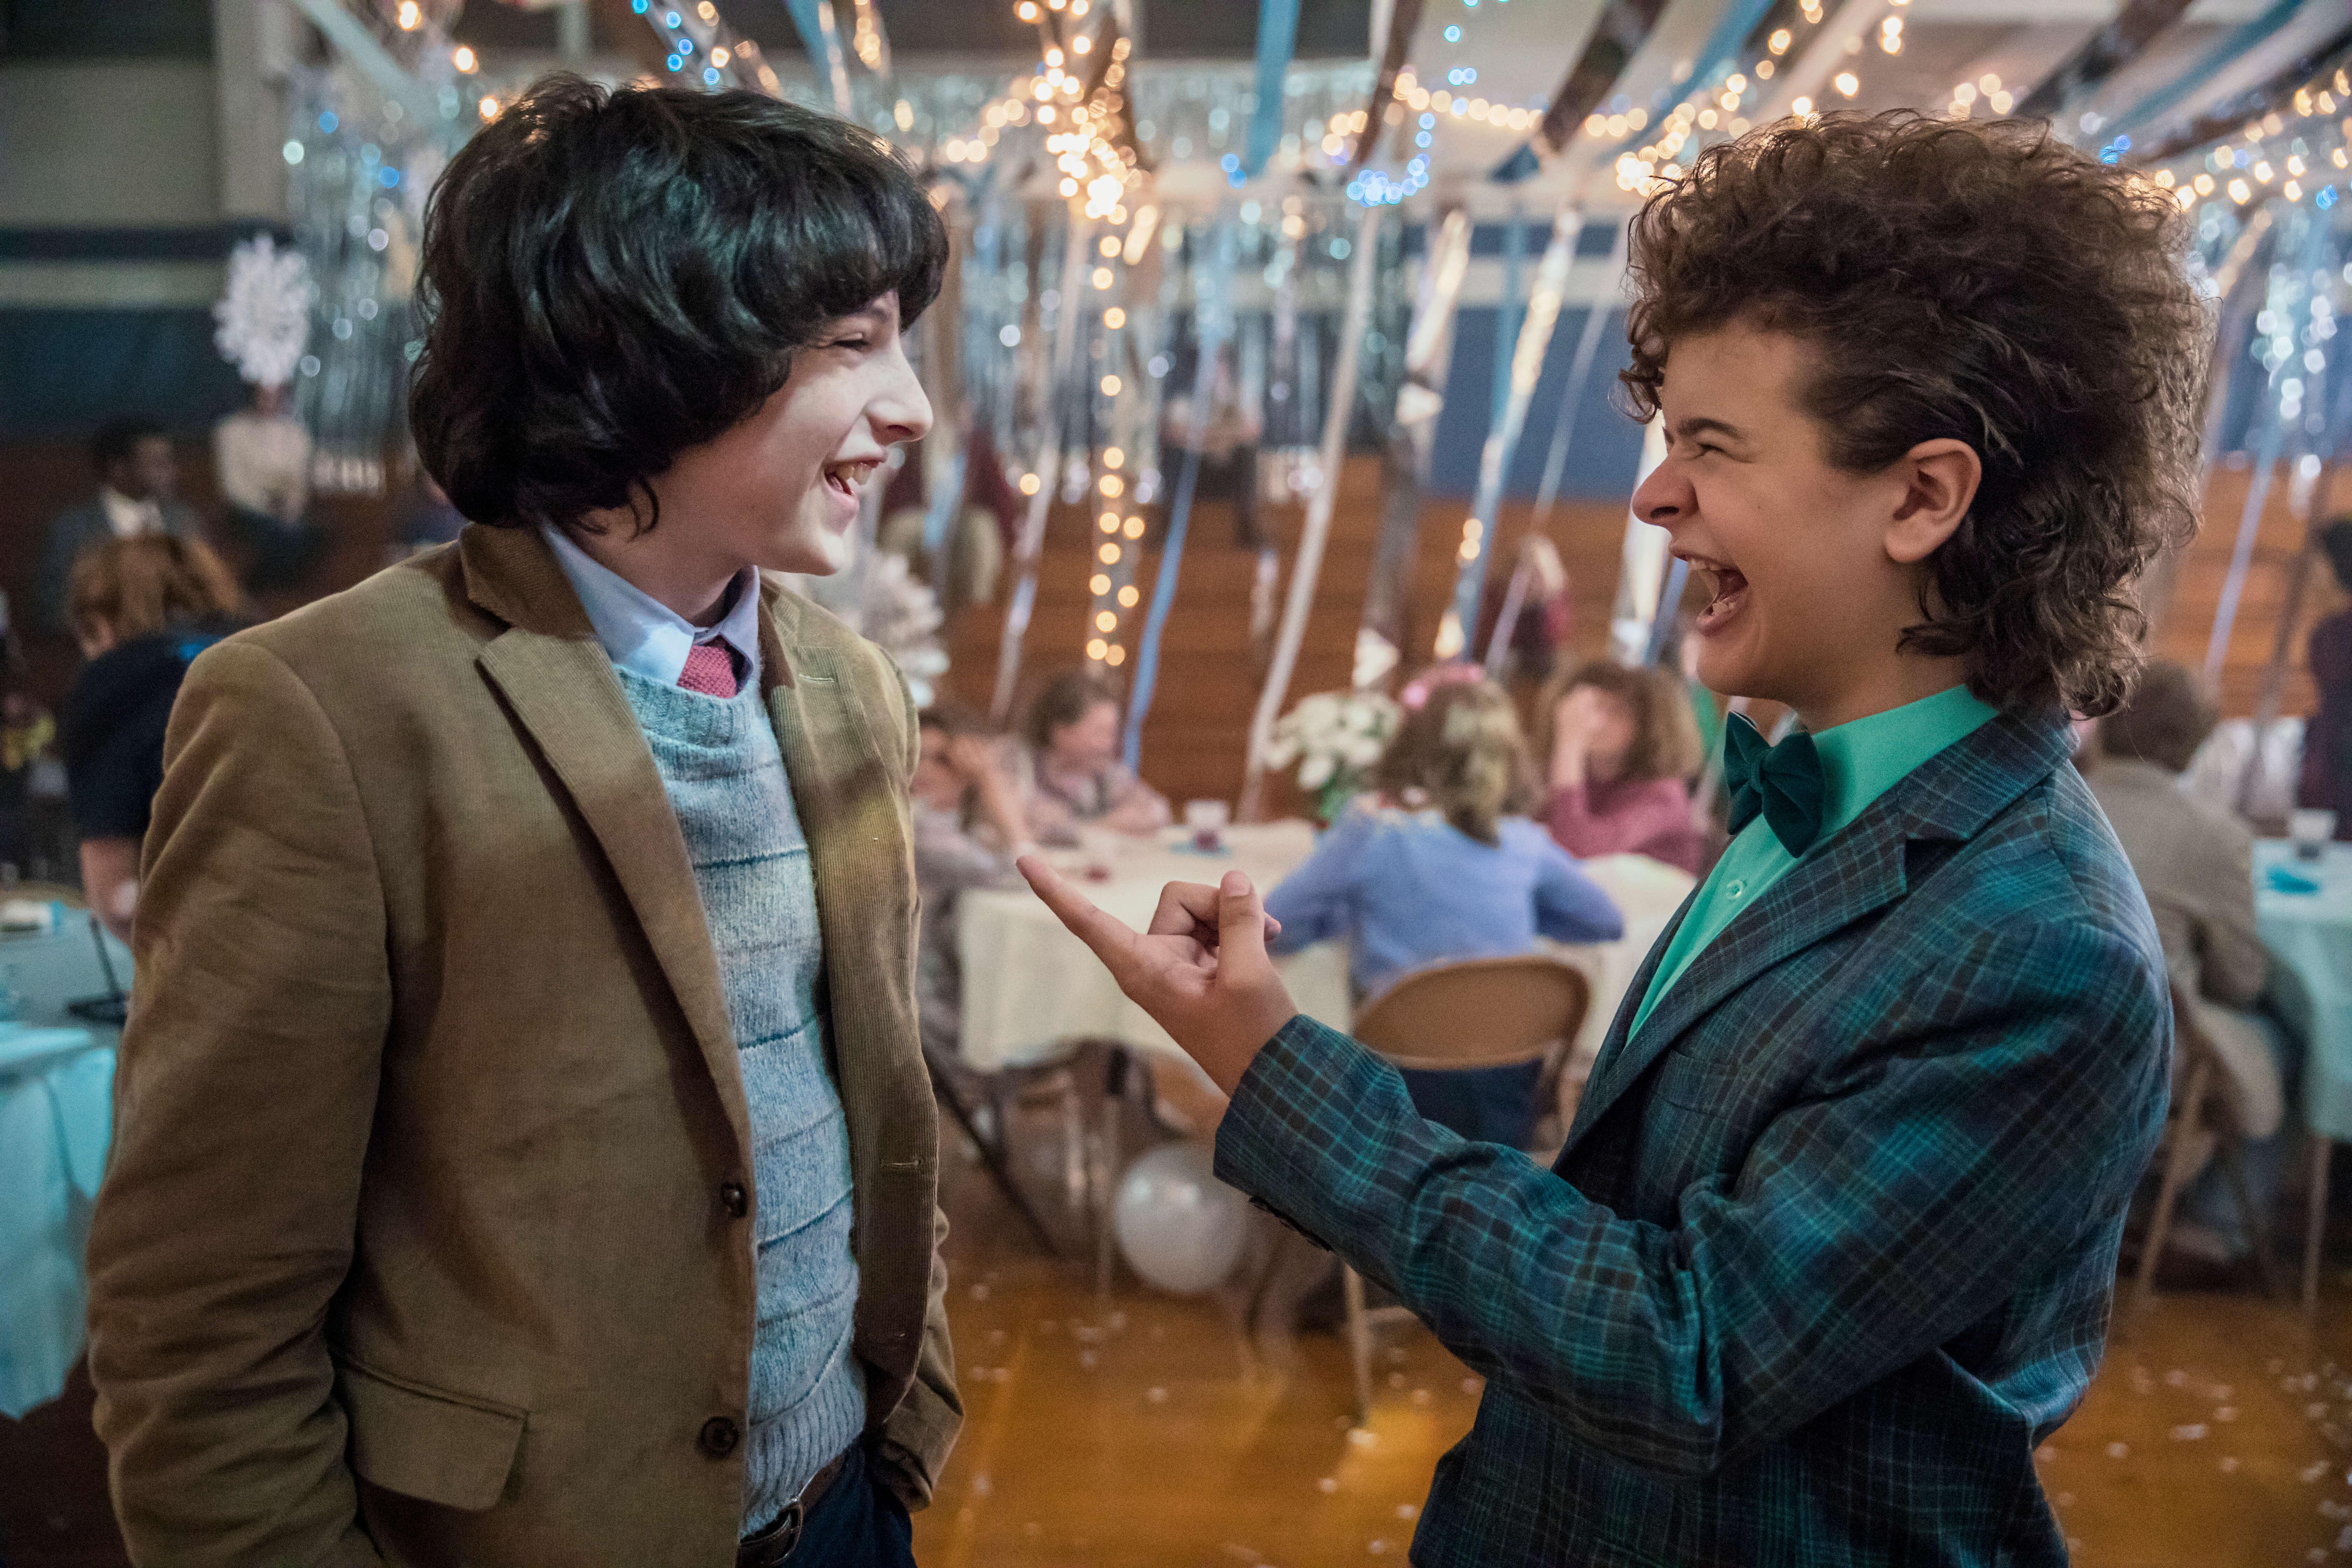 Sci-fi hit 'Stranger Things' tops digital downloads list